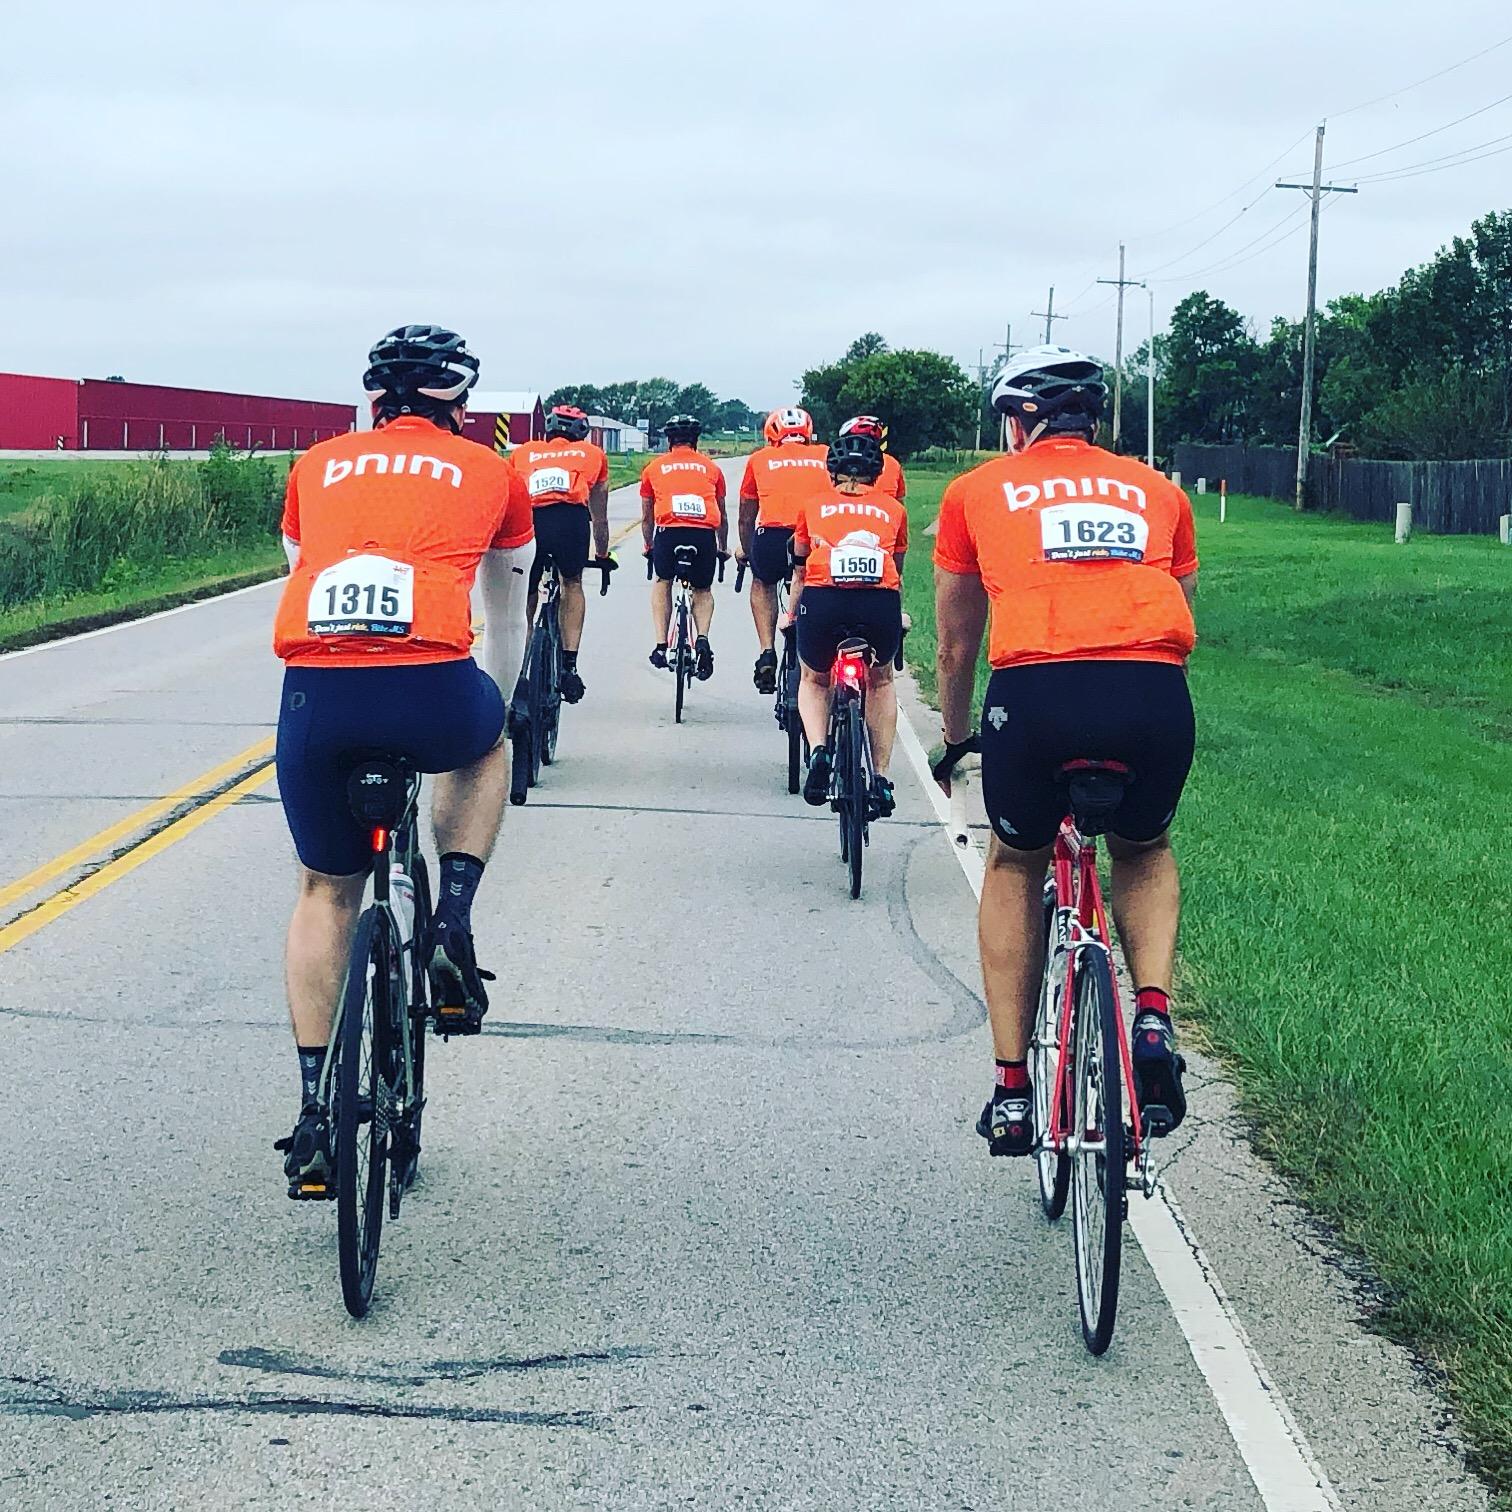 BNIM Rides and Raises for Bike MS